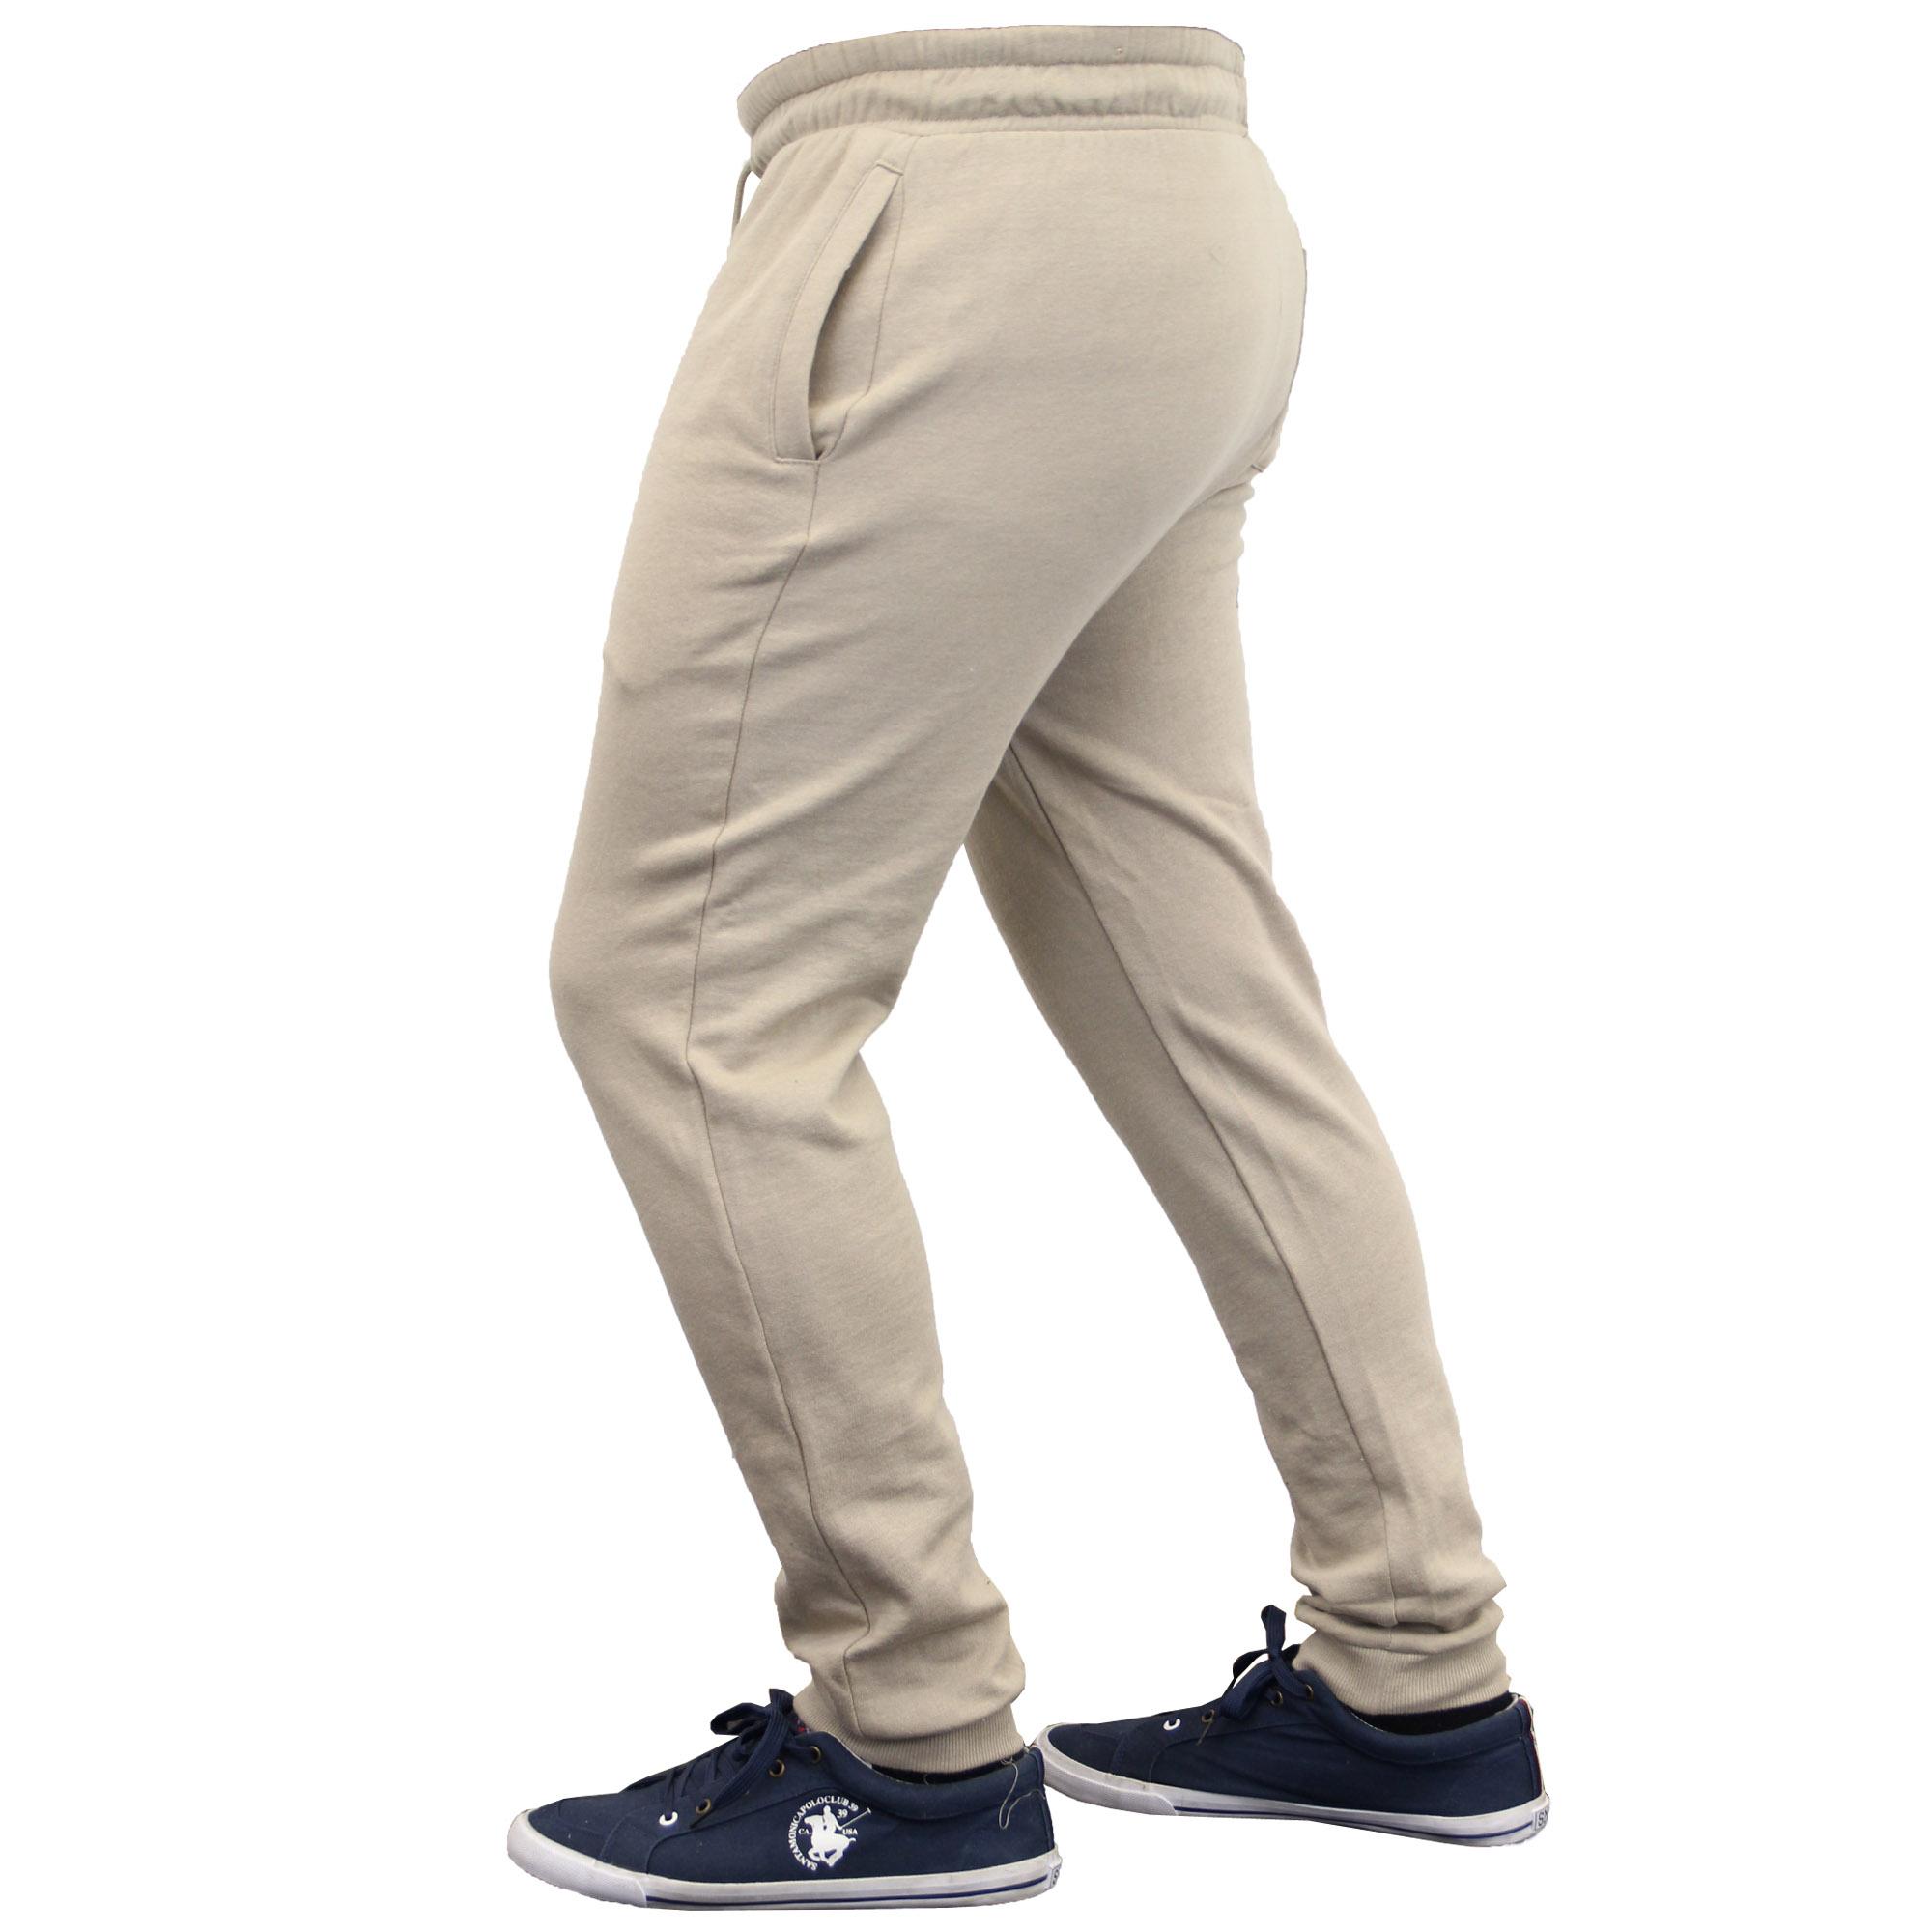 Mens Bottoms Brave Soul Jogging Trousers Pants Running Gym Fleece Lined Winter